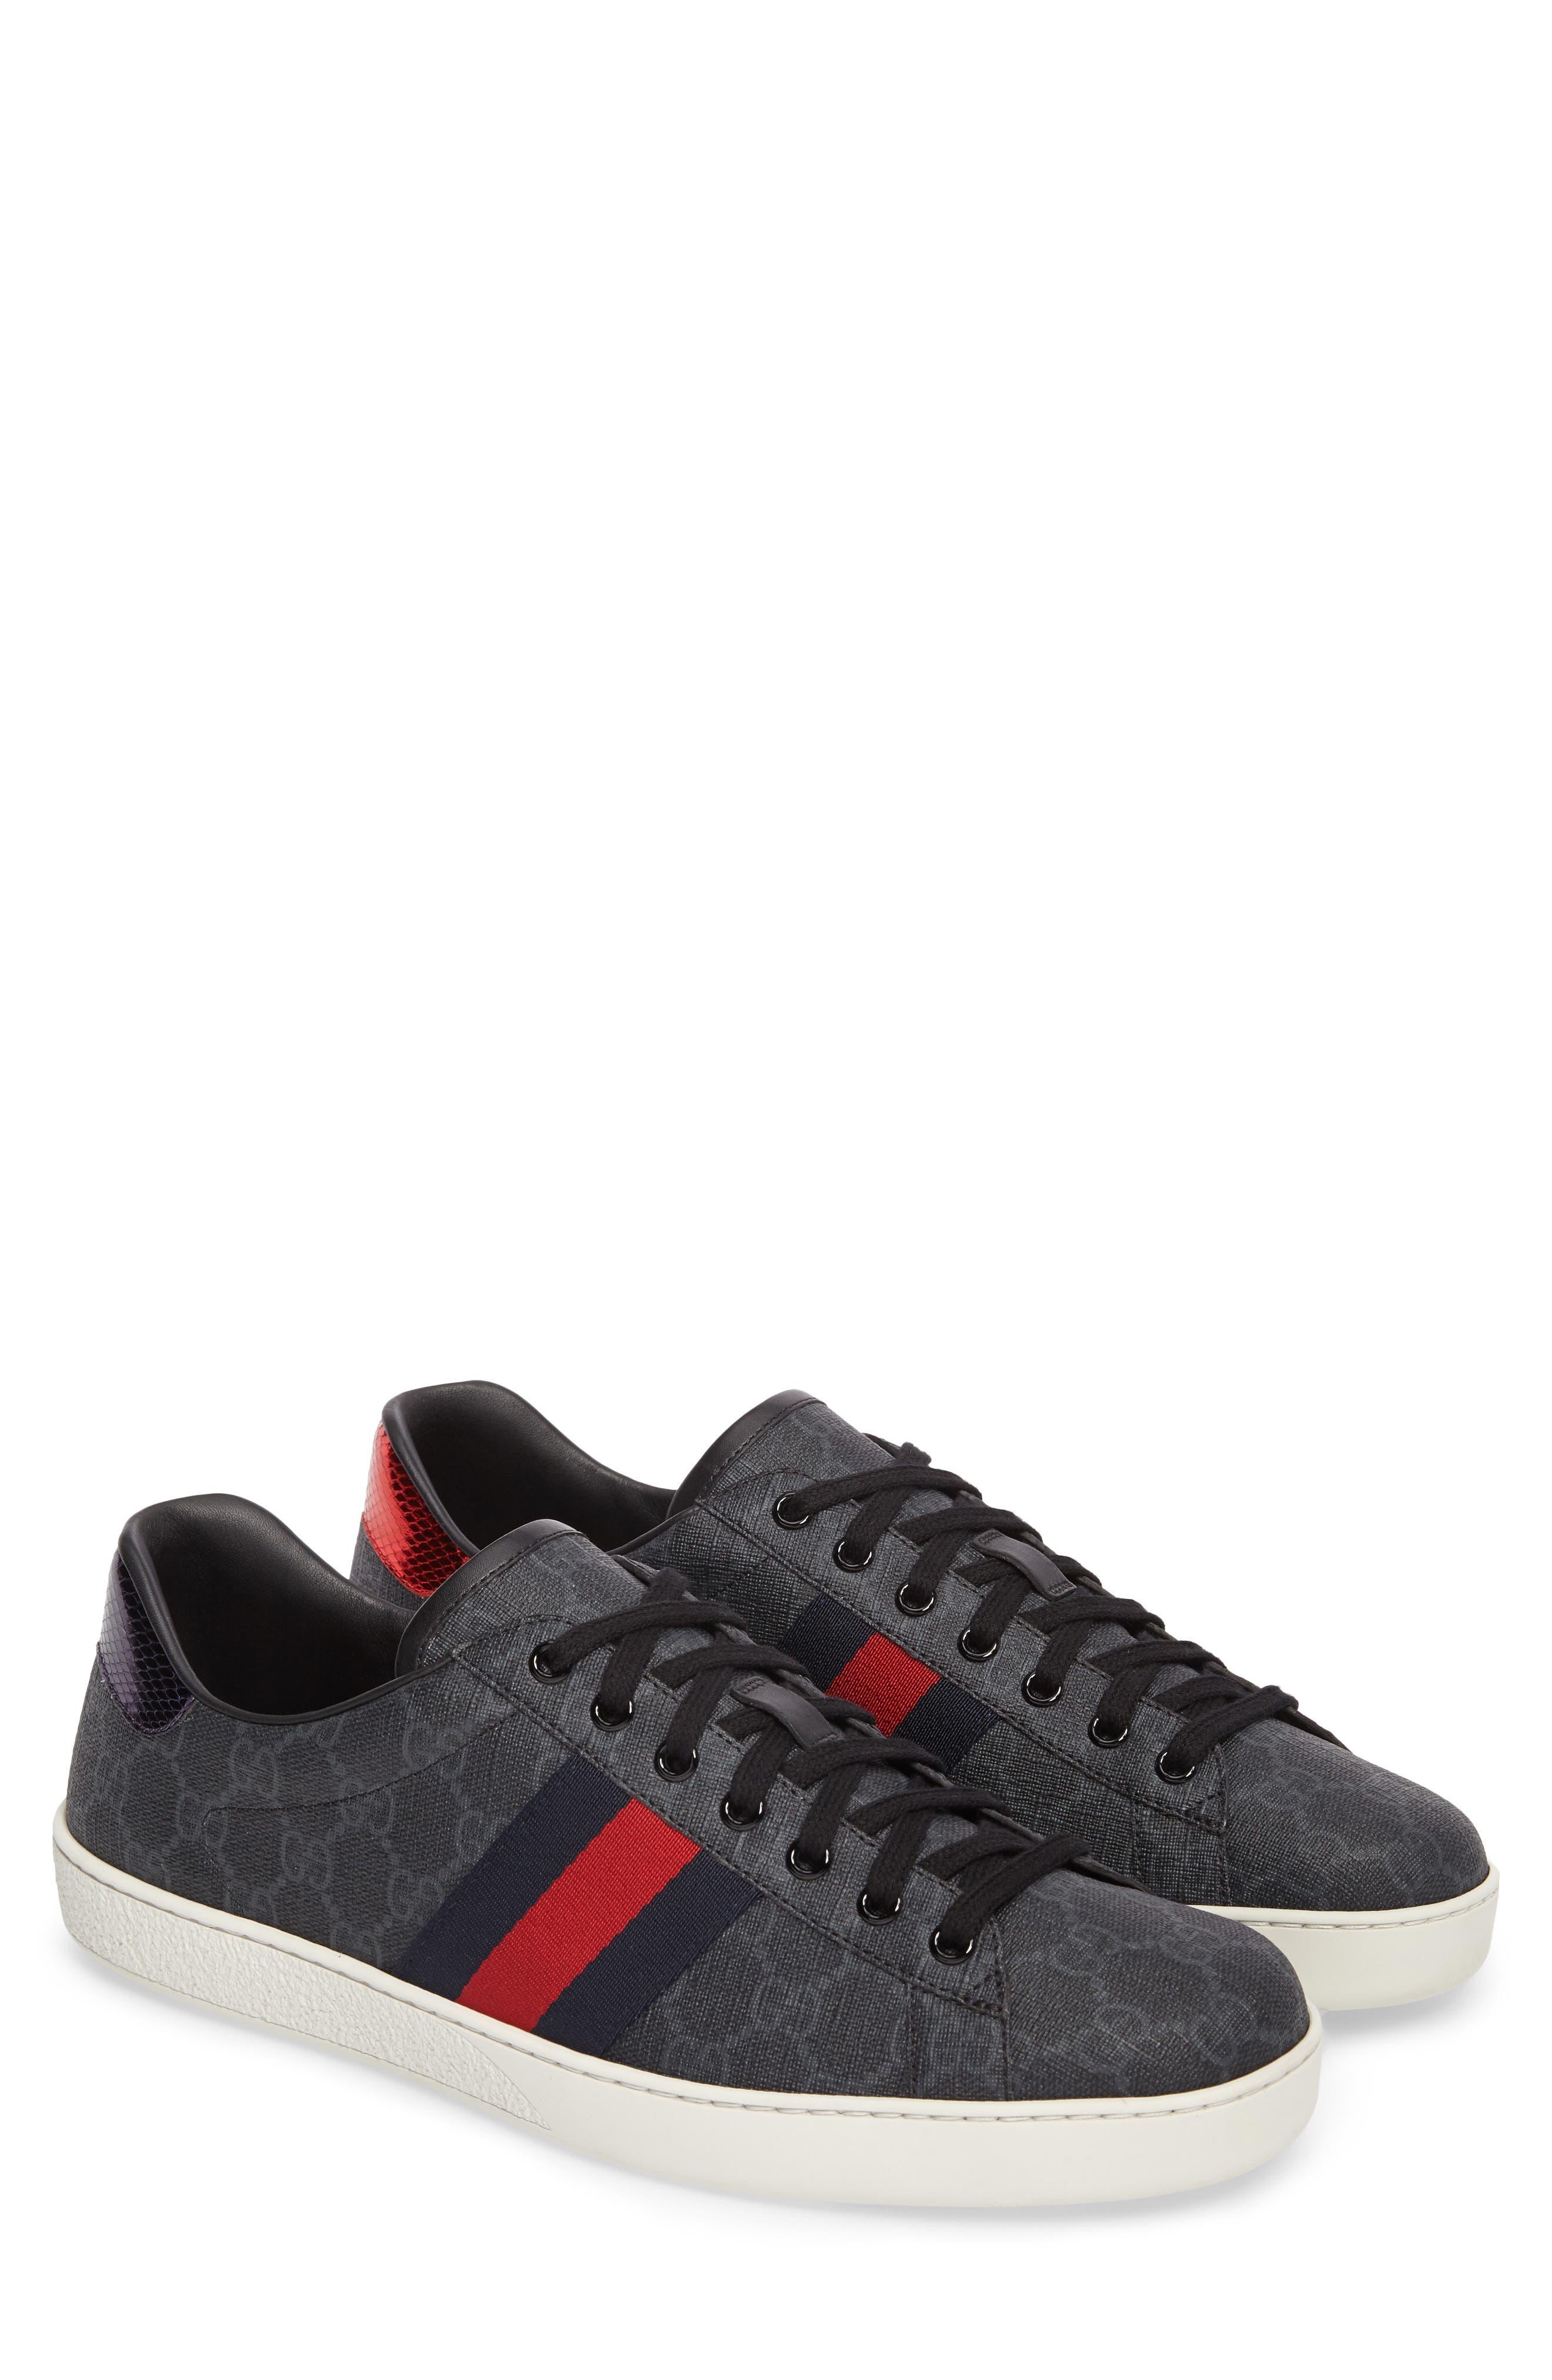 Main Image - Gucci 'New Ace' Sneaker (Men)